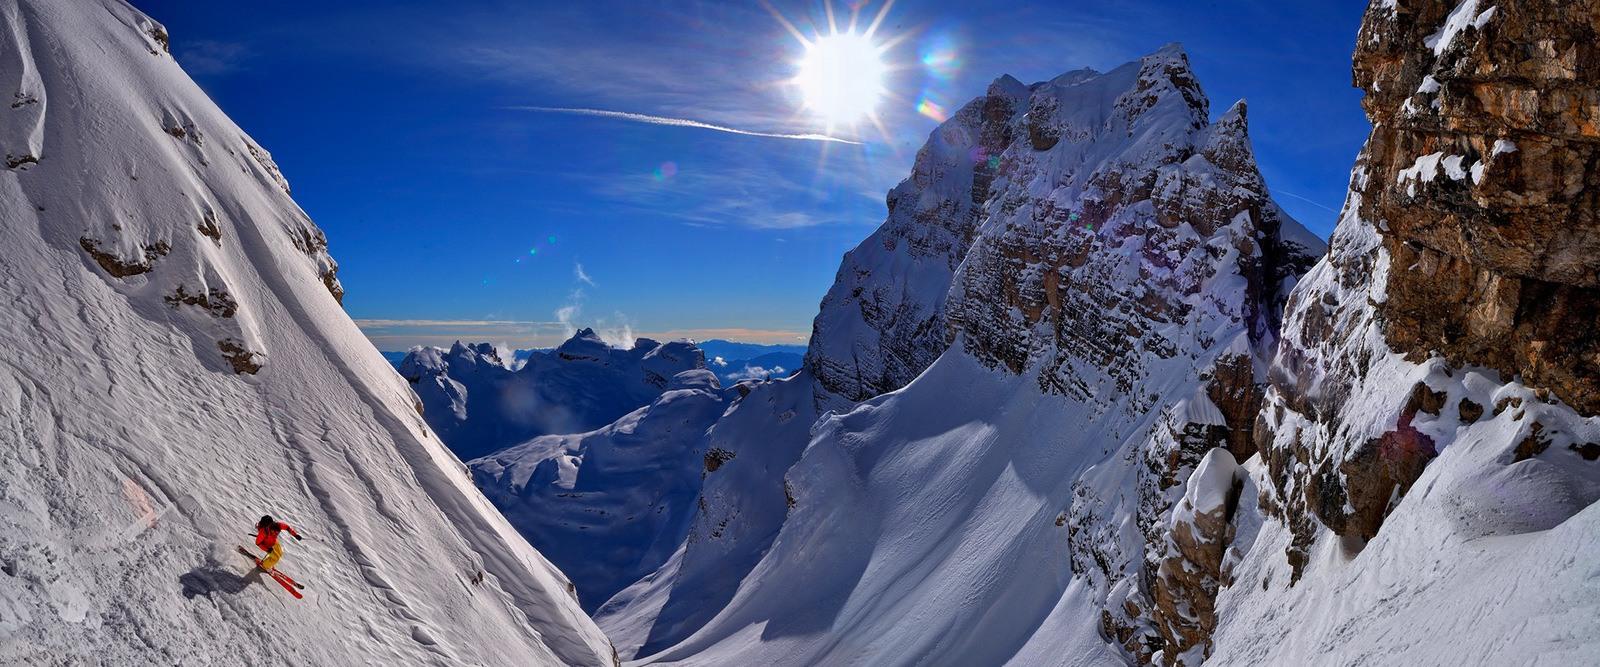 category-slider-10-winter